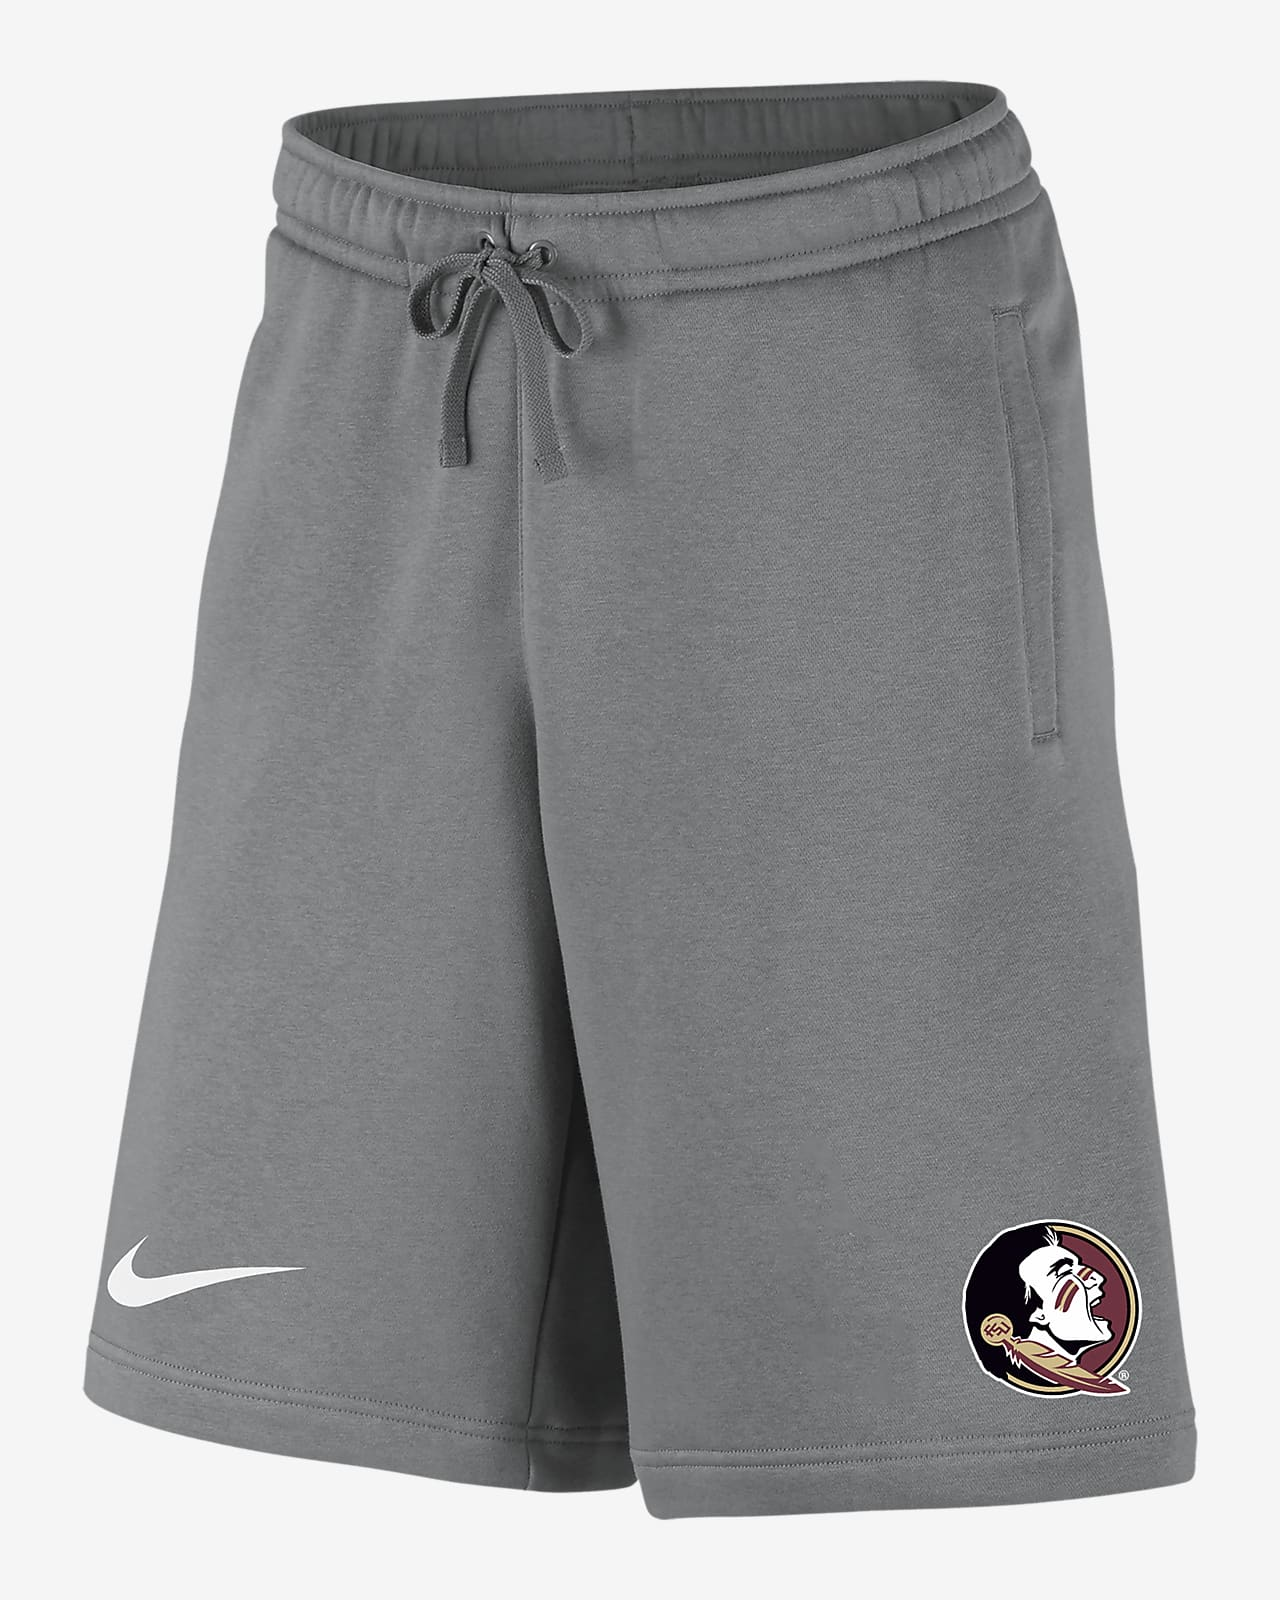 Nike College (Florida State) Men's Fleece Shorts